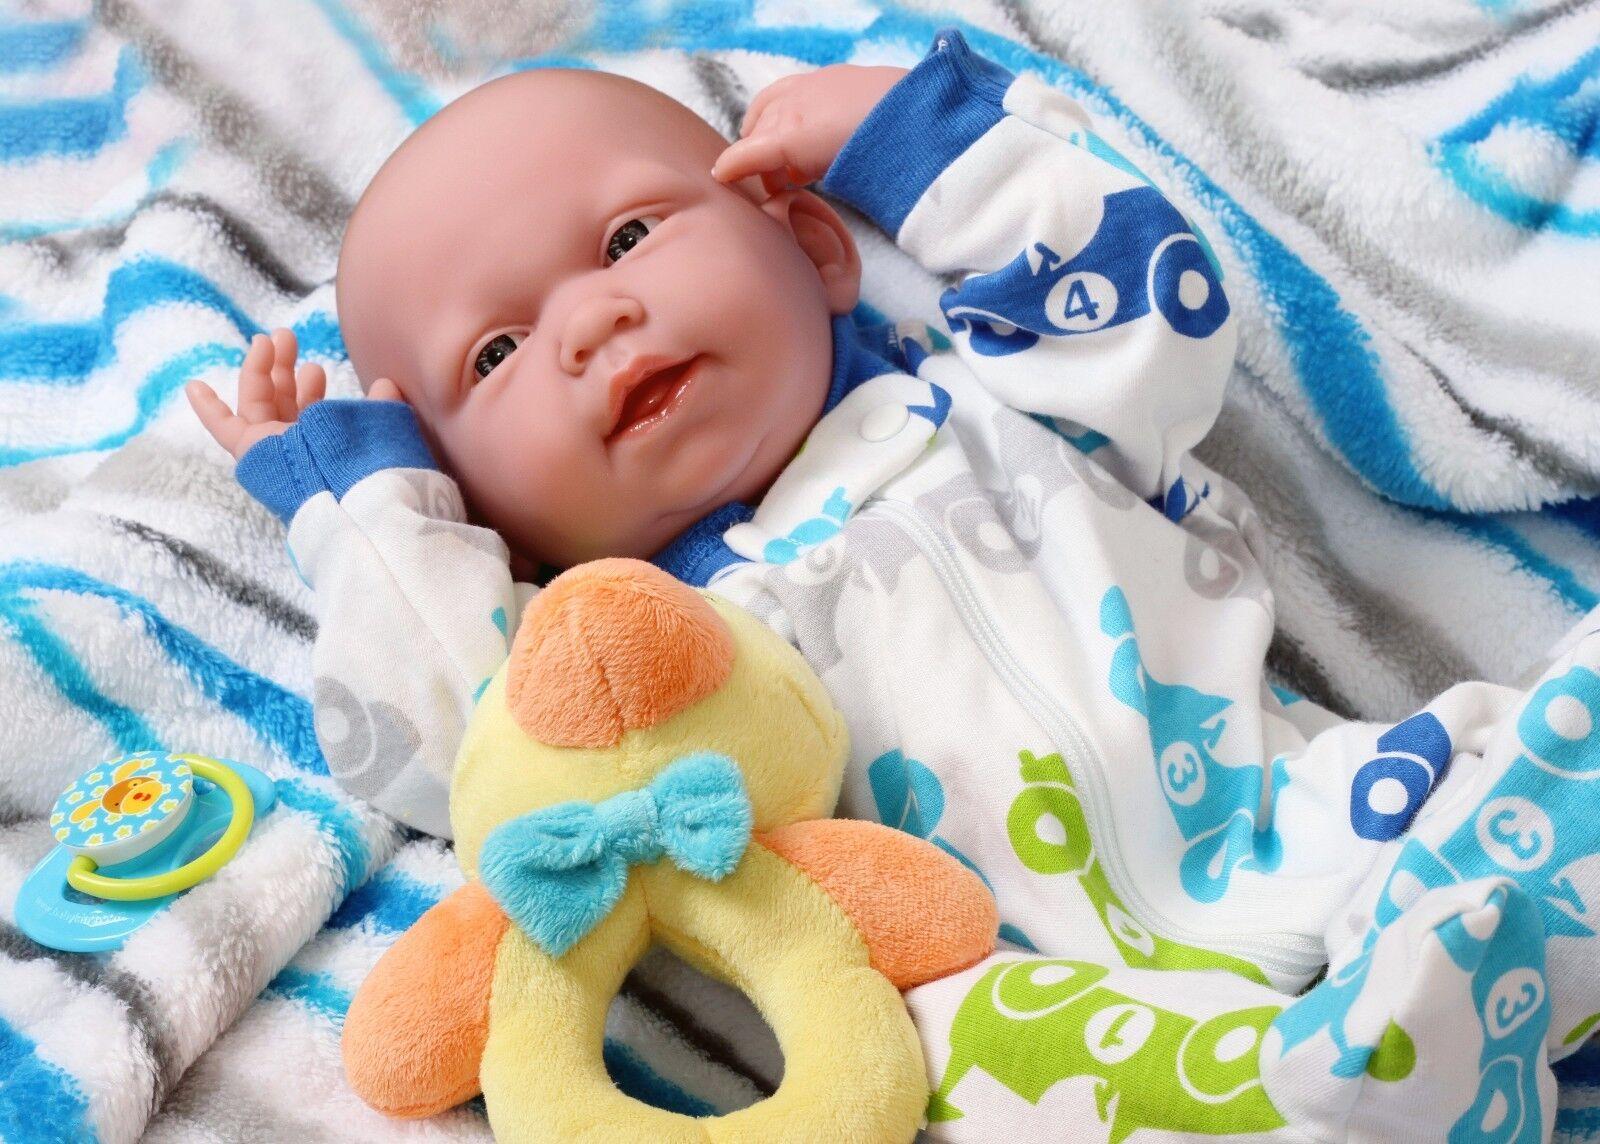 Muñeca Bebé Niño correcto 15 pulgadas Real Vivo Vinilo Suave bathable Preemie realista